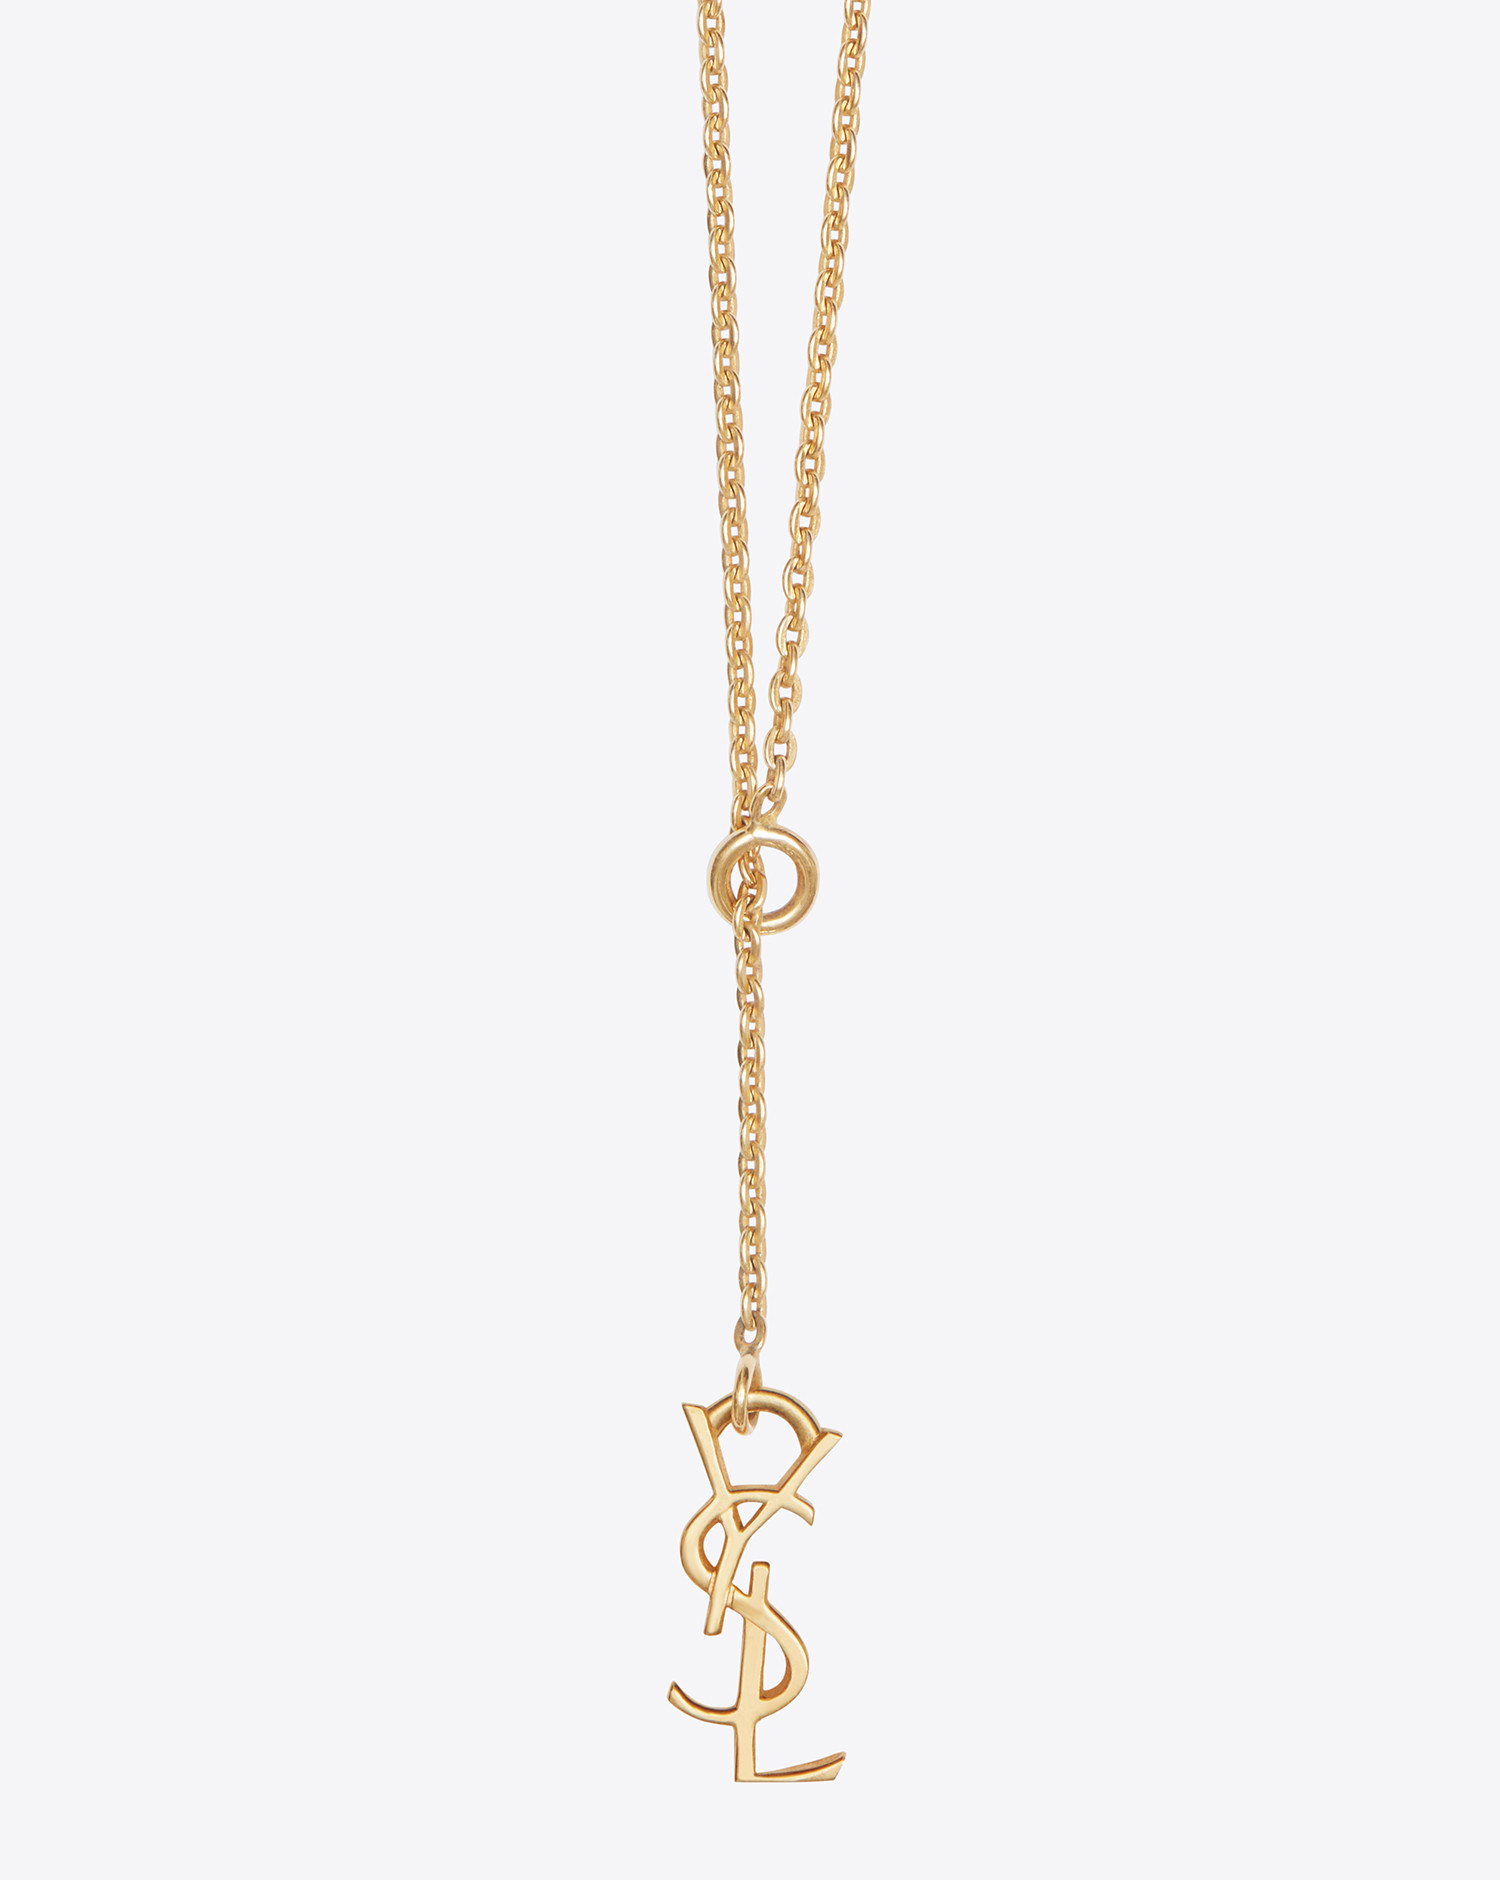 aec47b13c0d Saint Laurent Monogram Thin Tie Necklace In Gold Vermeil in Metallic ...